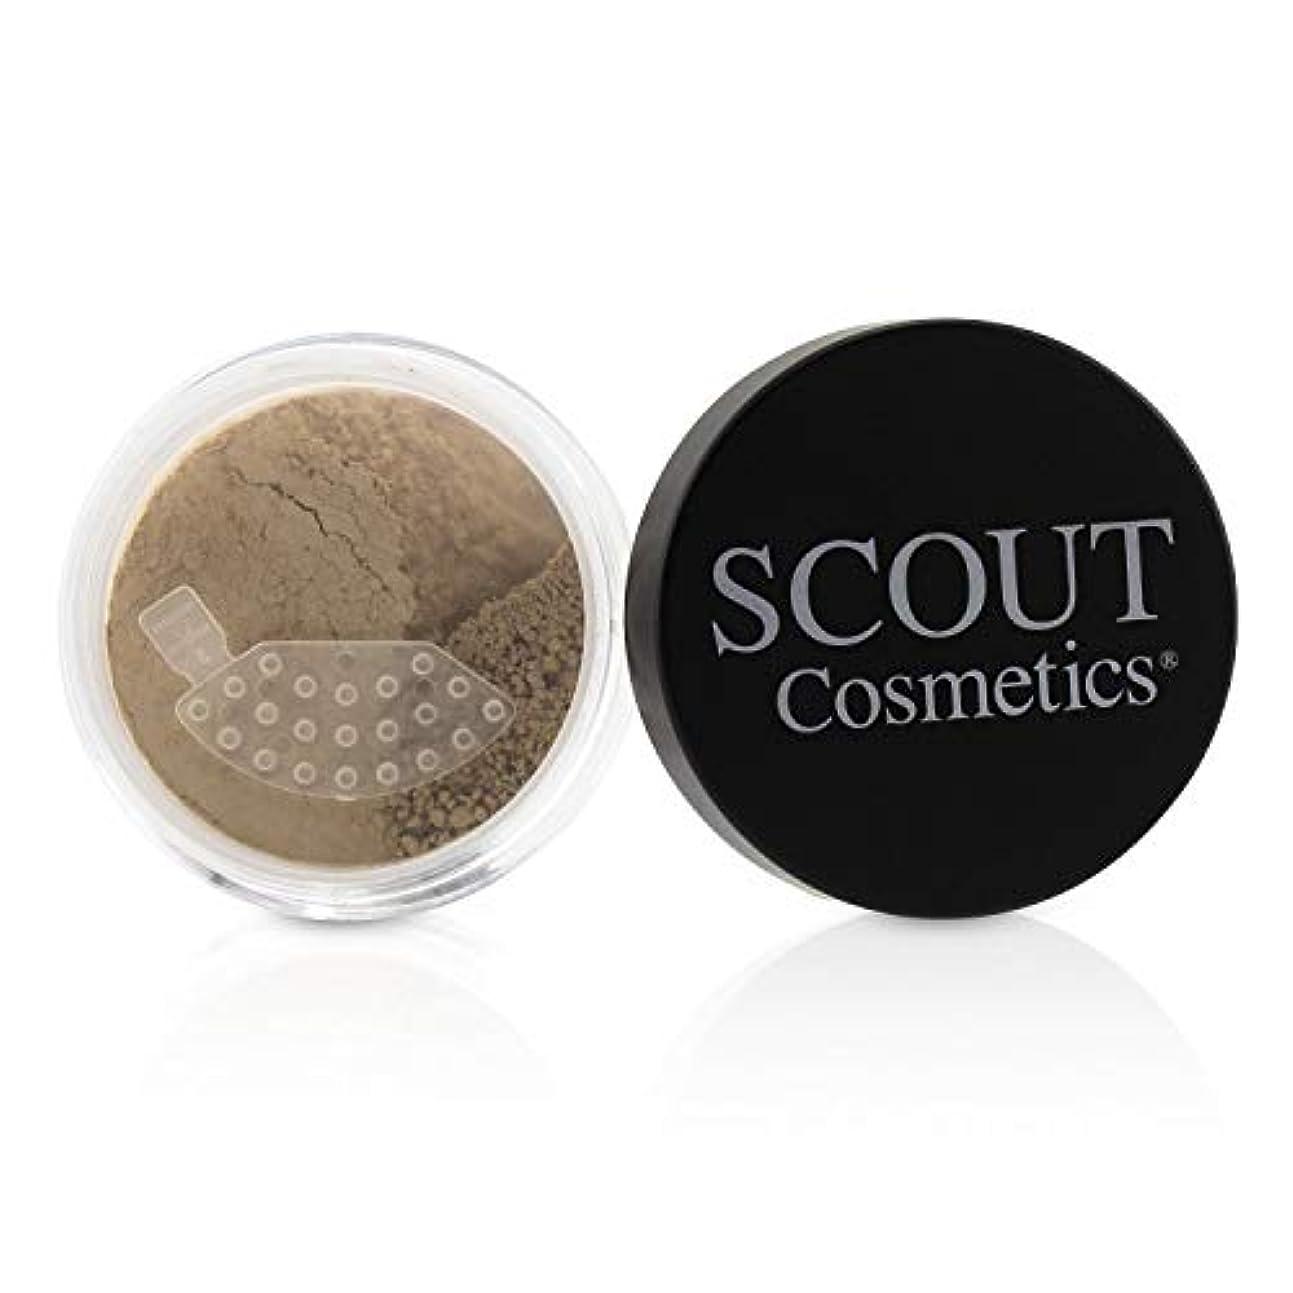 収穫思想主権者SCOUT Cosmetics Mineral Powder Foundation SPF 20 - # Camel 8g/0.28oz並行輸入品